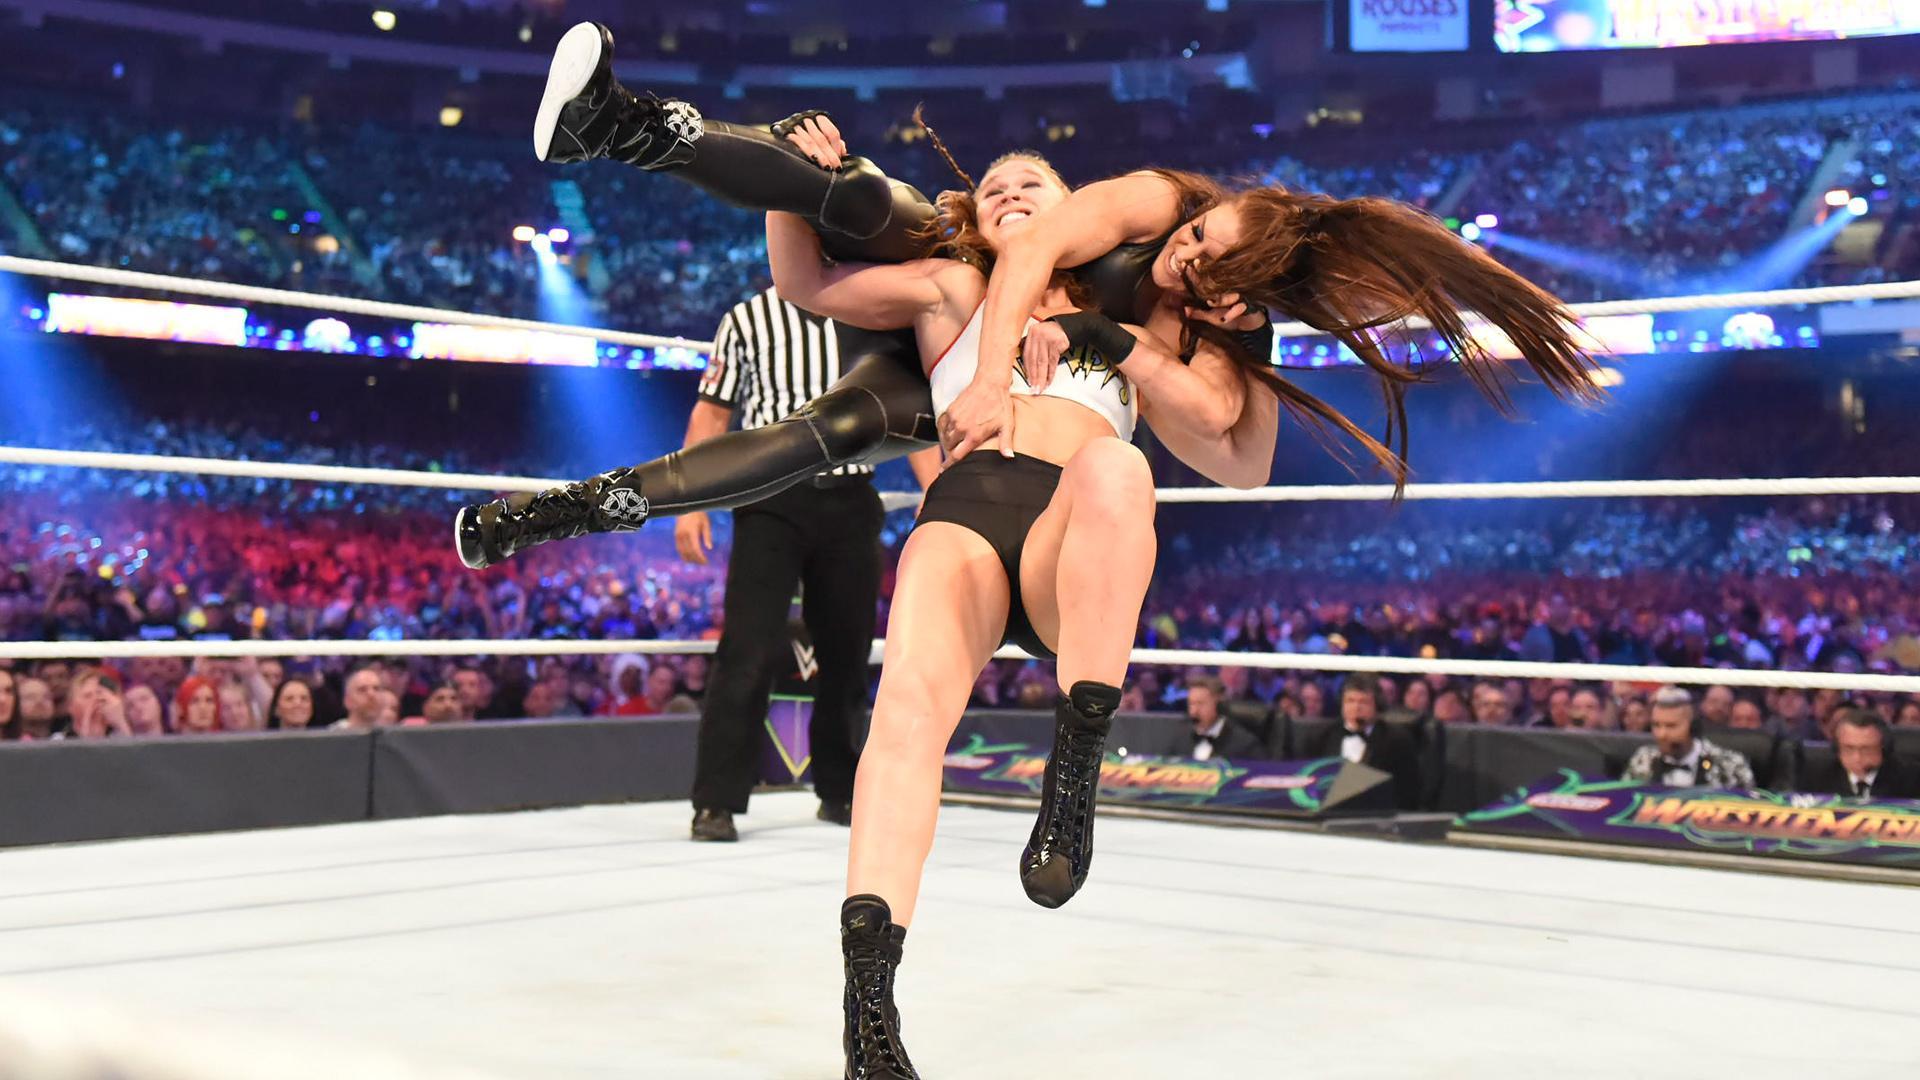 Ronda Rousey Kurt Angle vs Triple H Stephanie McMahon